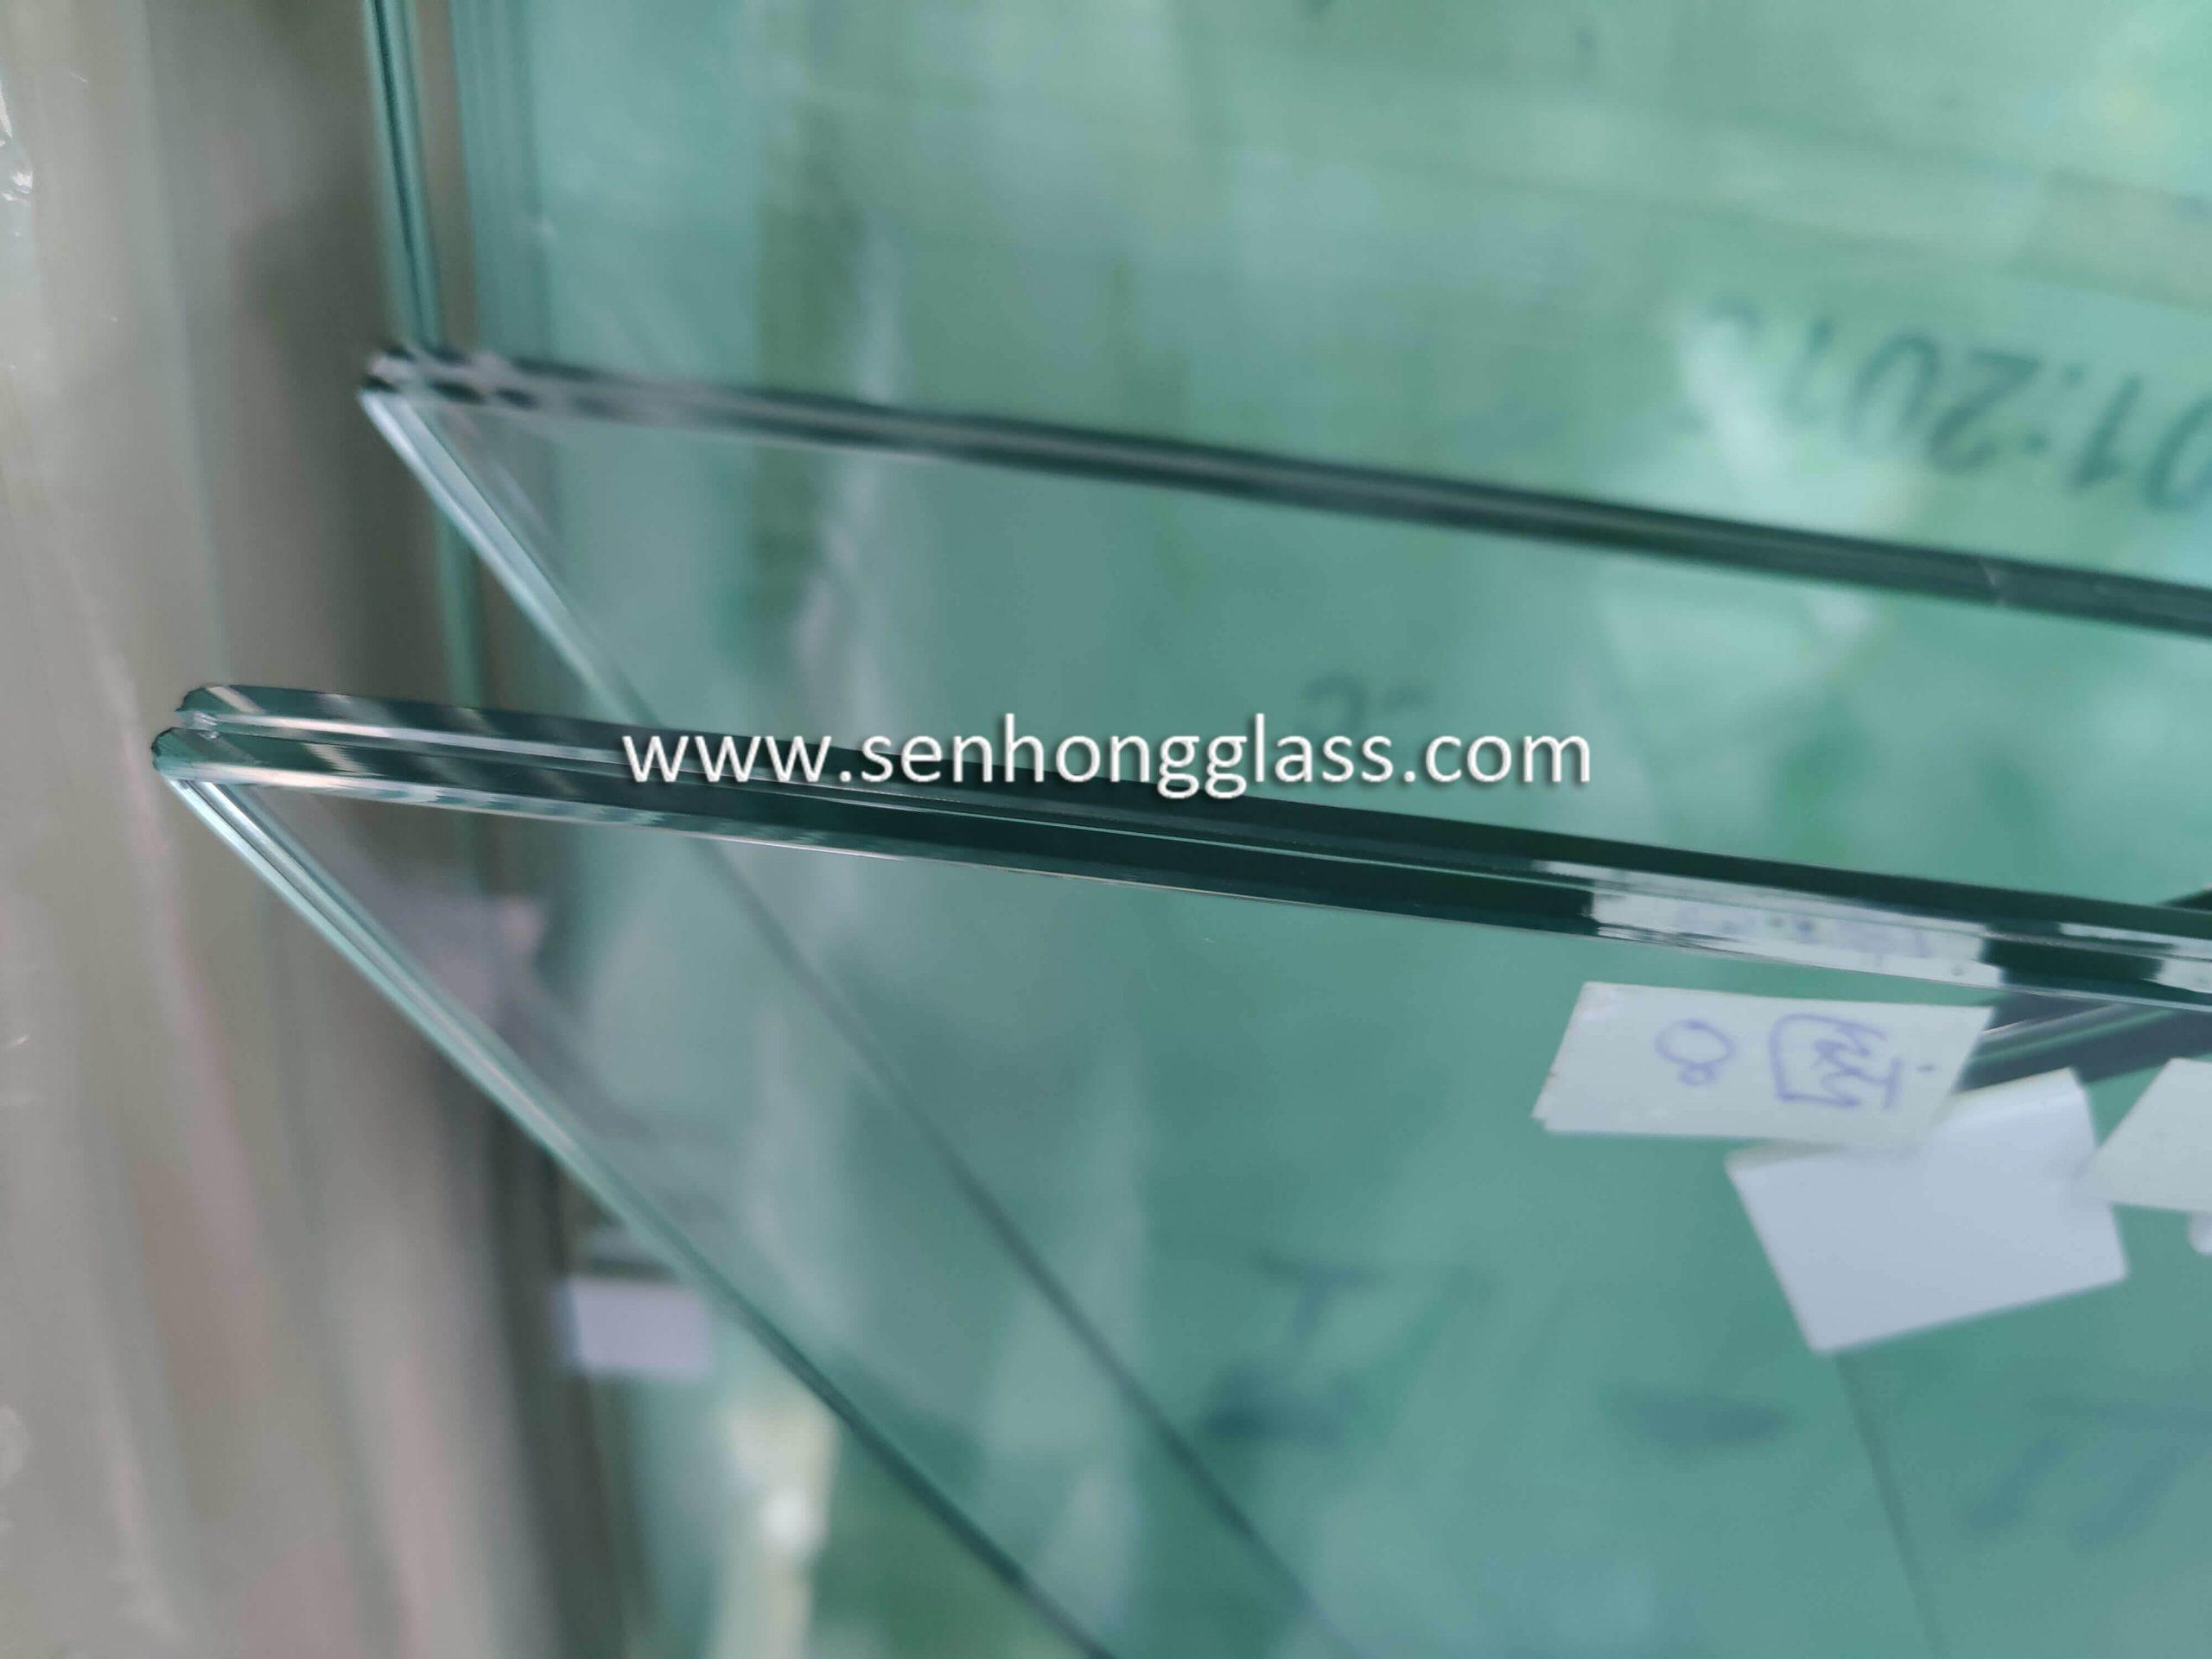 13.52mm-clear-tempered-laminated-glass-polished-edges-irregular-shape-China-Shandong-Senhong-Glass-2